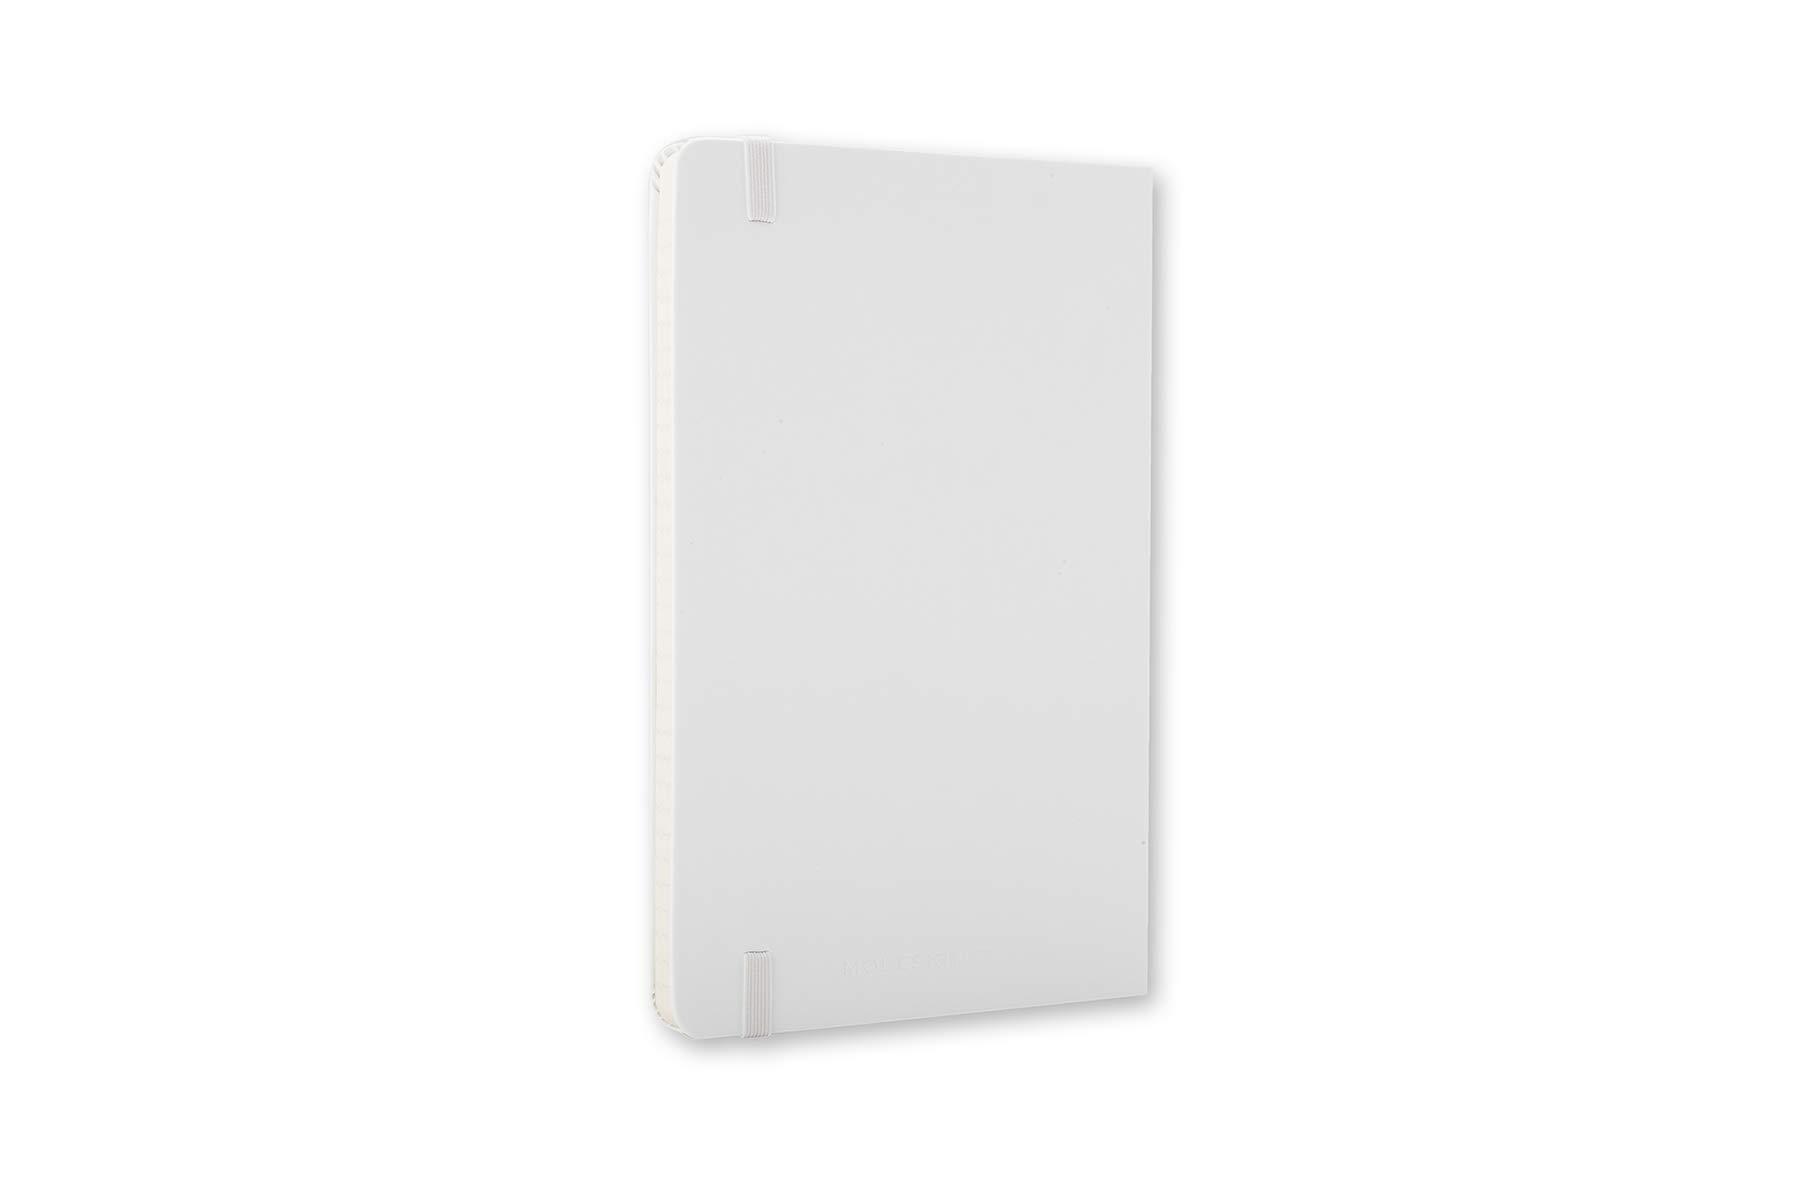 Moleskine Classic Notebook, Hard Cover, Large (5'' x 8.25'') Ruled/Lined, White by Moleskine (Image #6)